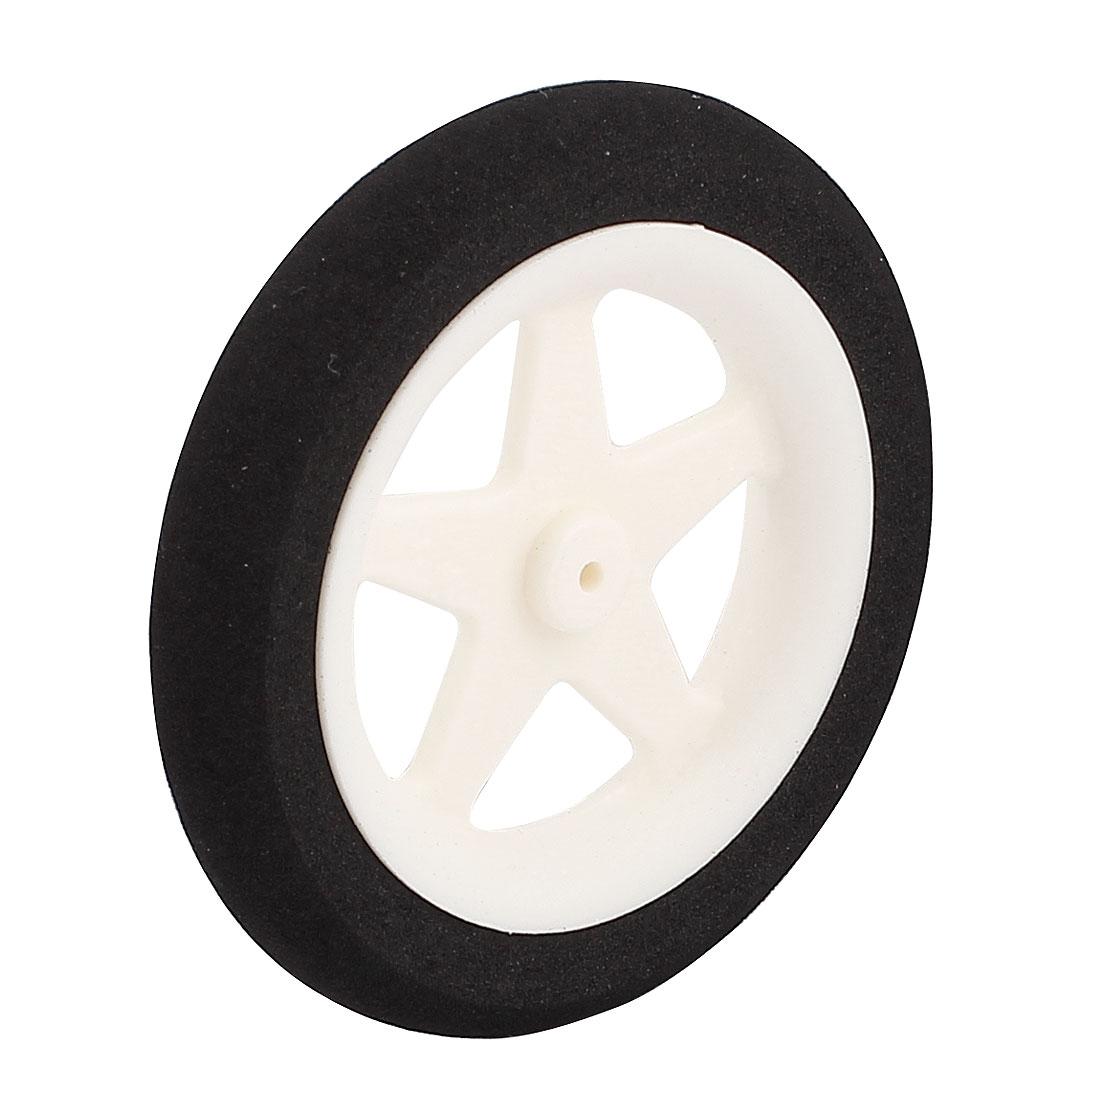 1.8mm Shaft Hole RC Plane Tail Tire Lightweight Sponge Wheel Metric Size D60 H10